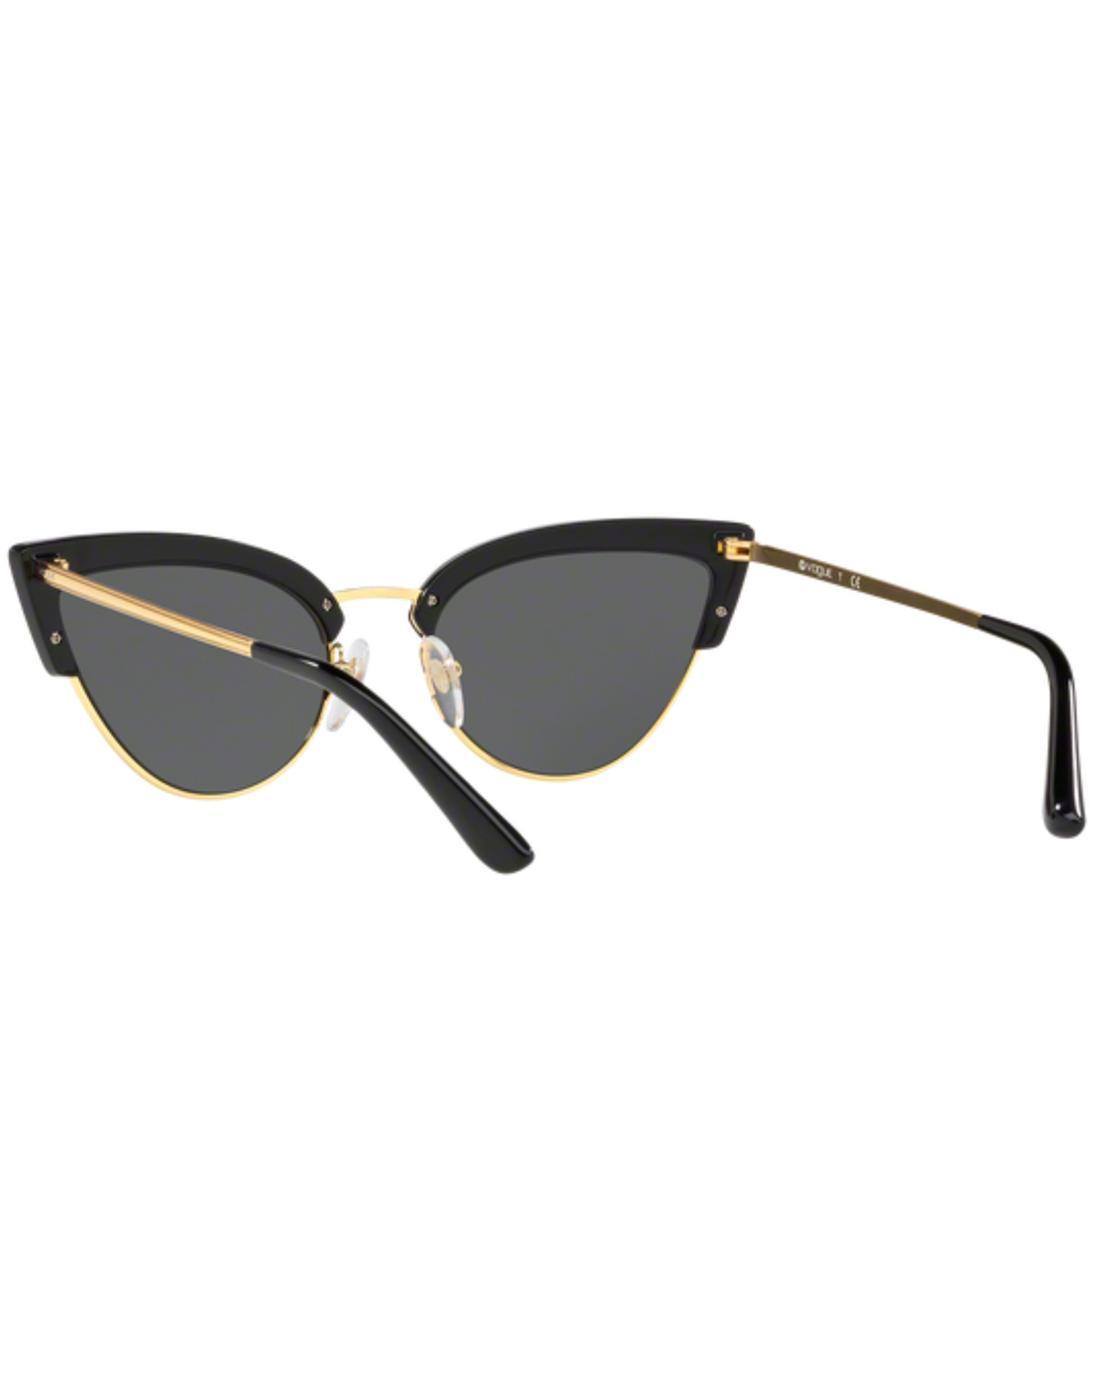 e184d4b86398 VOGUE Retro 50s Vintage Cats-Eye Sunglasses in Black